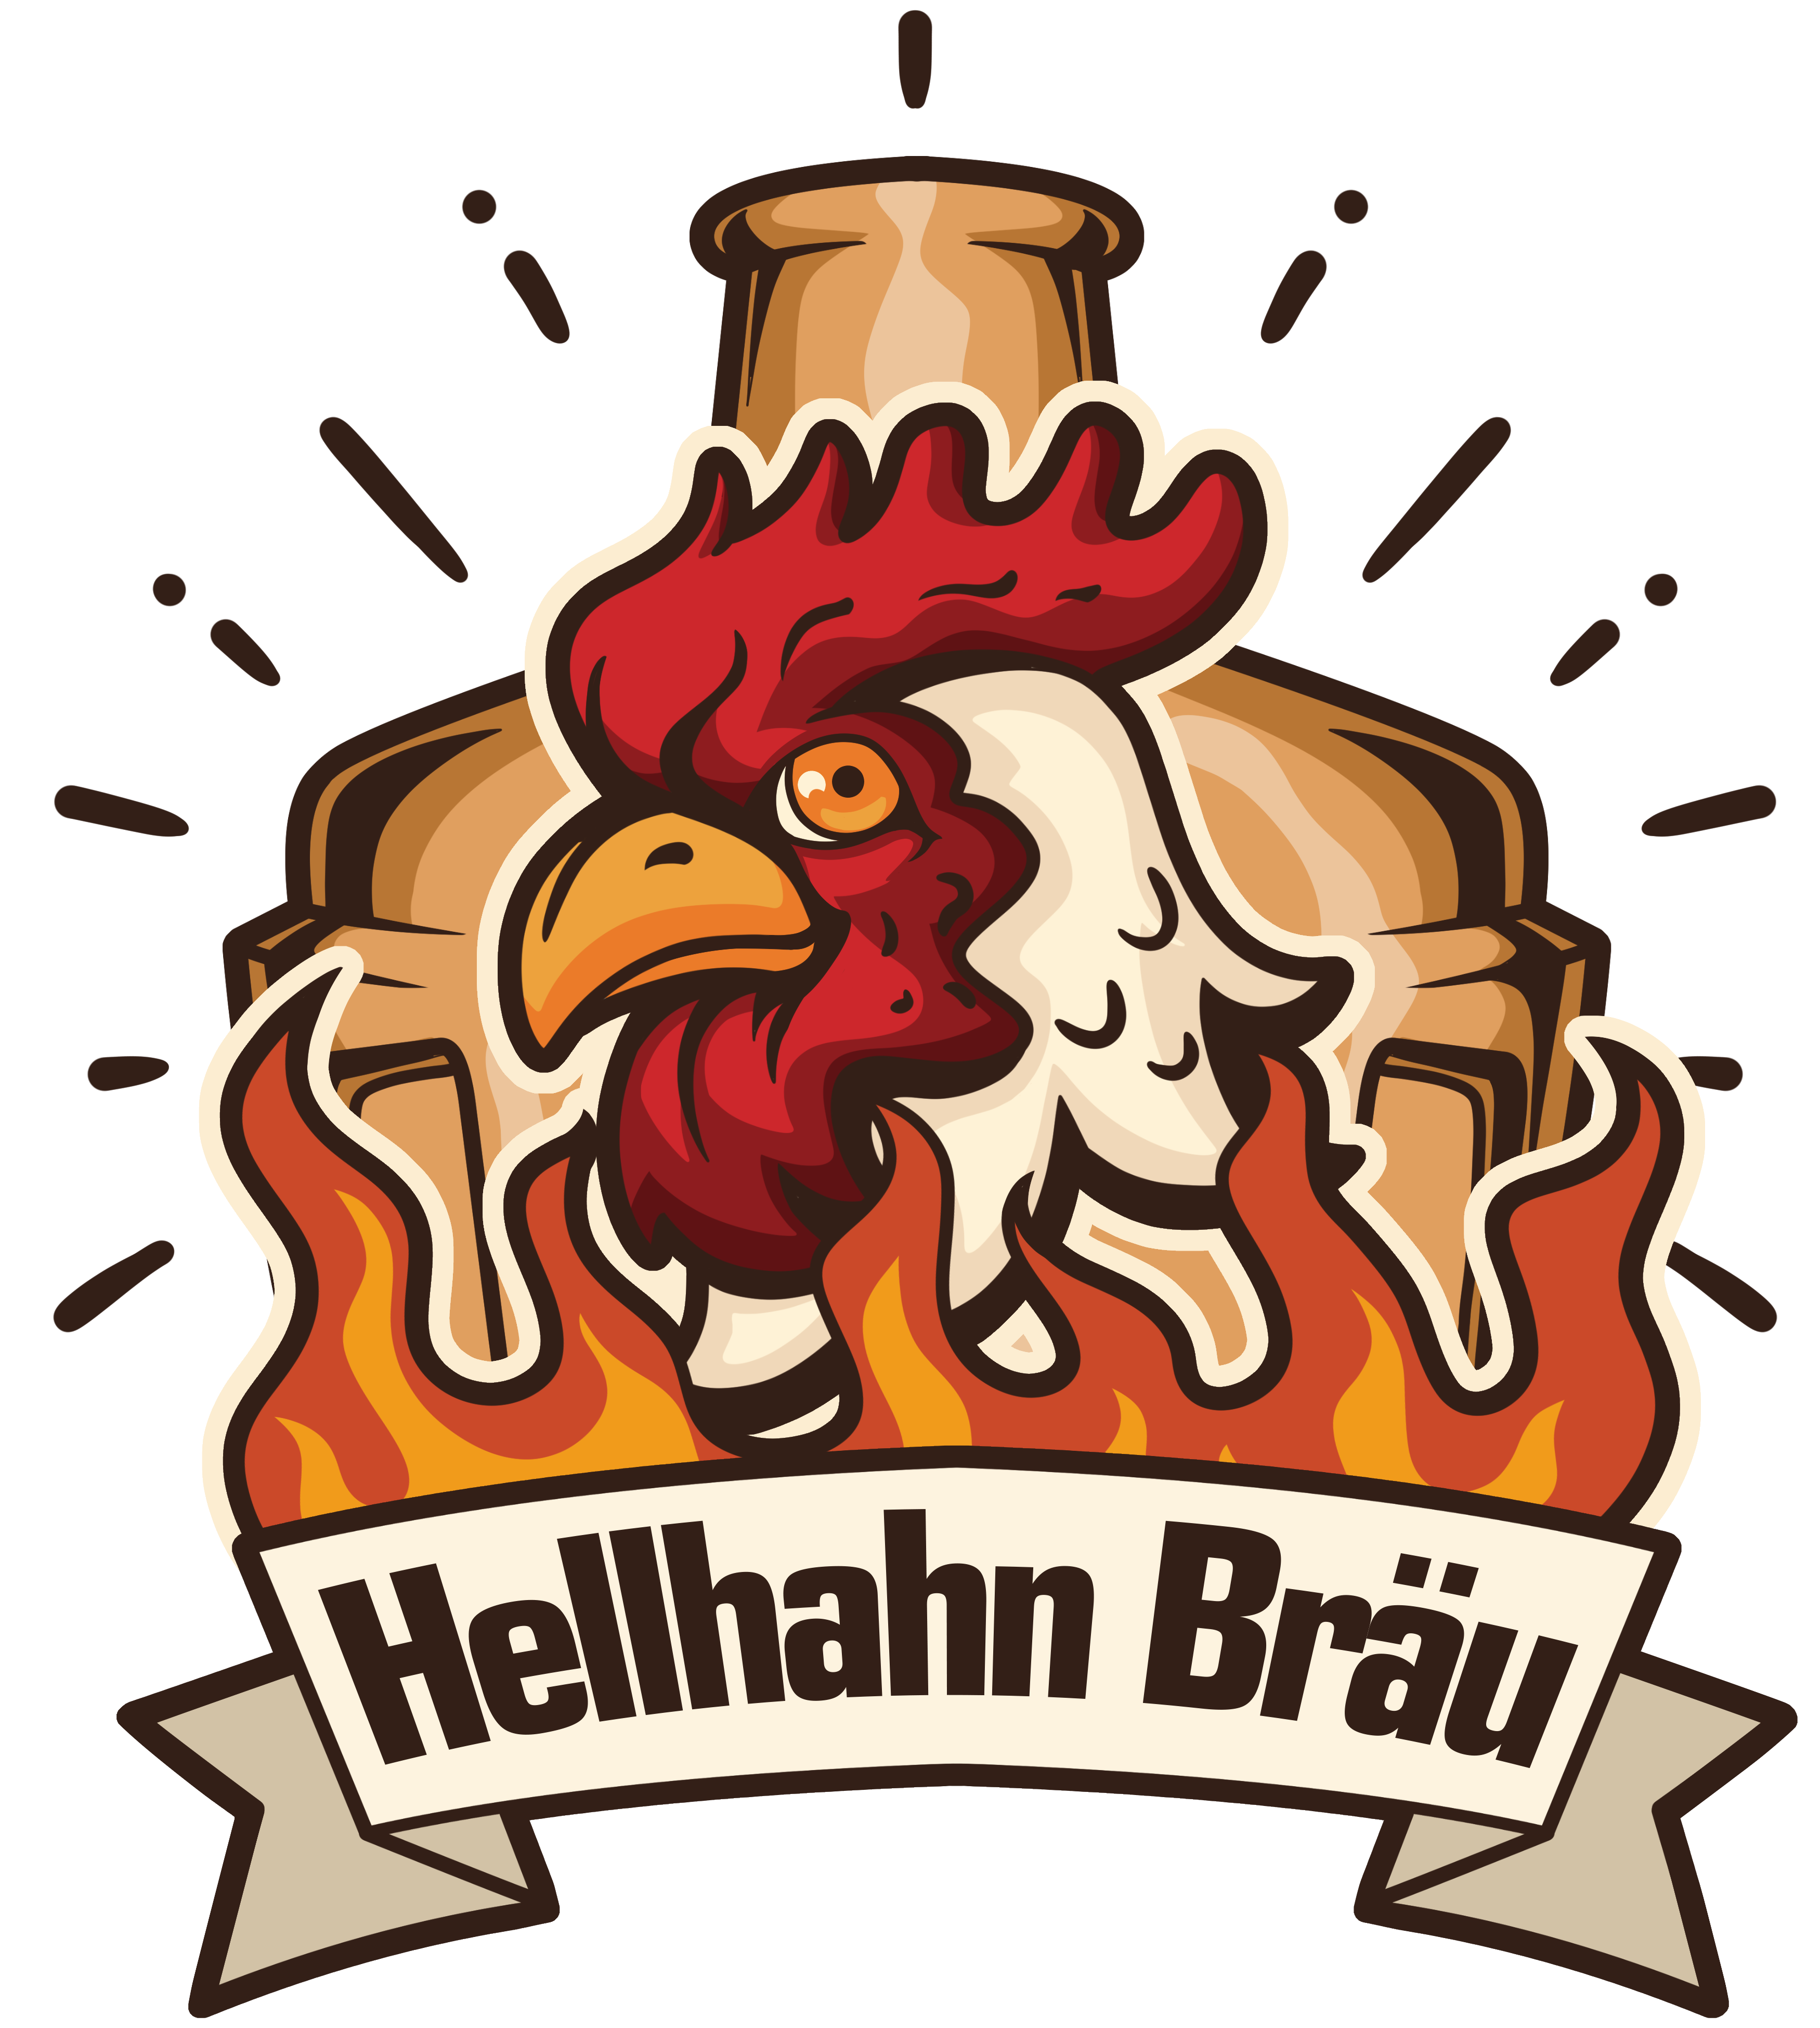 Hellhahnbraeu